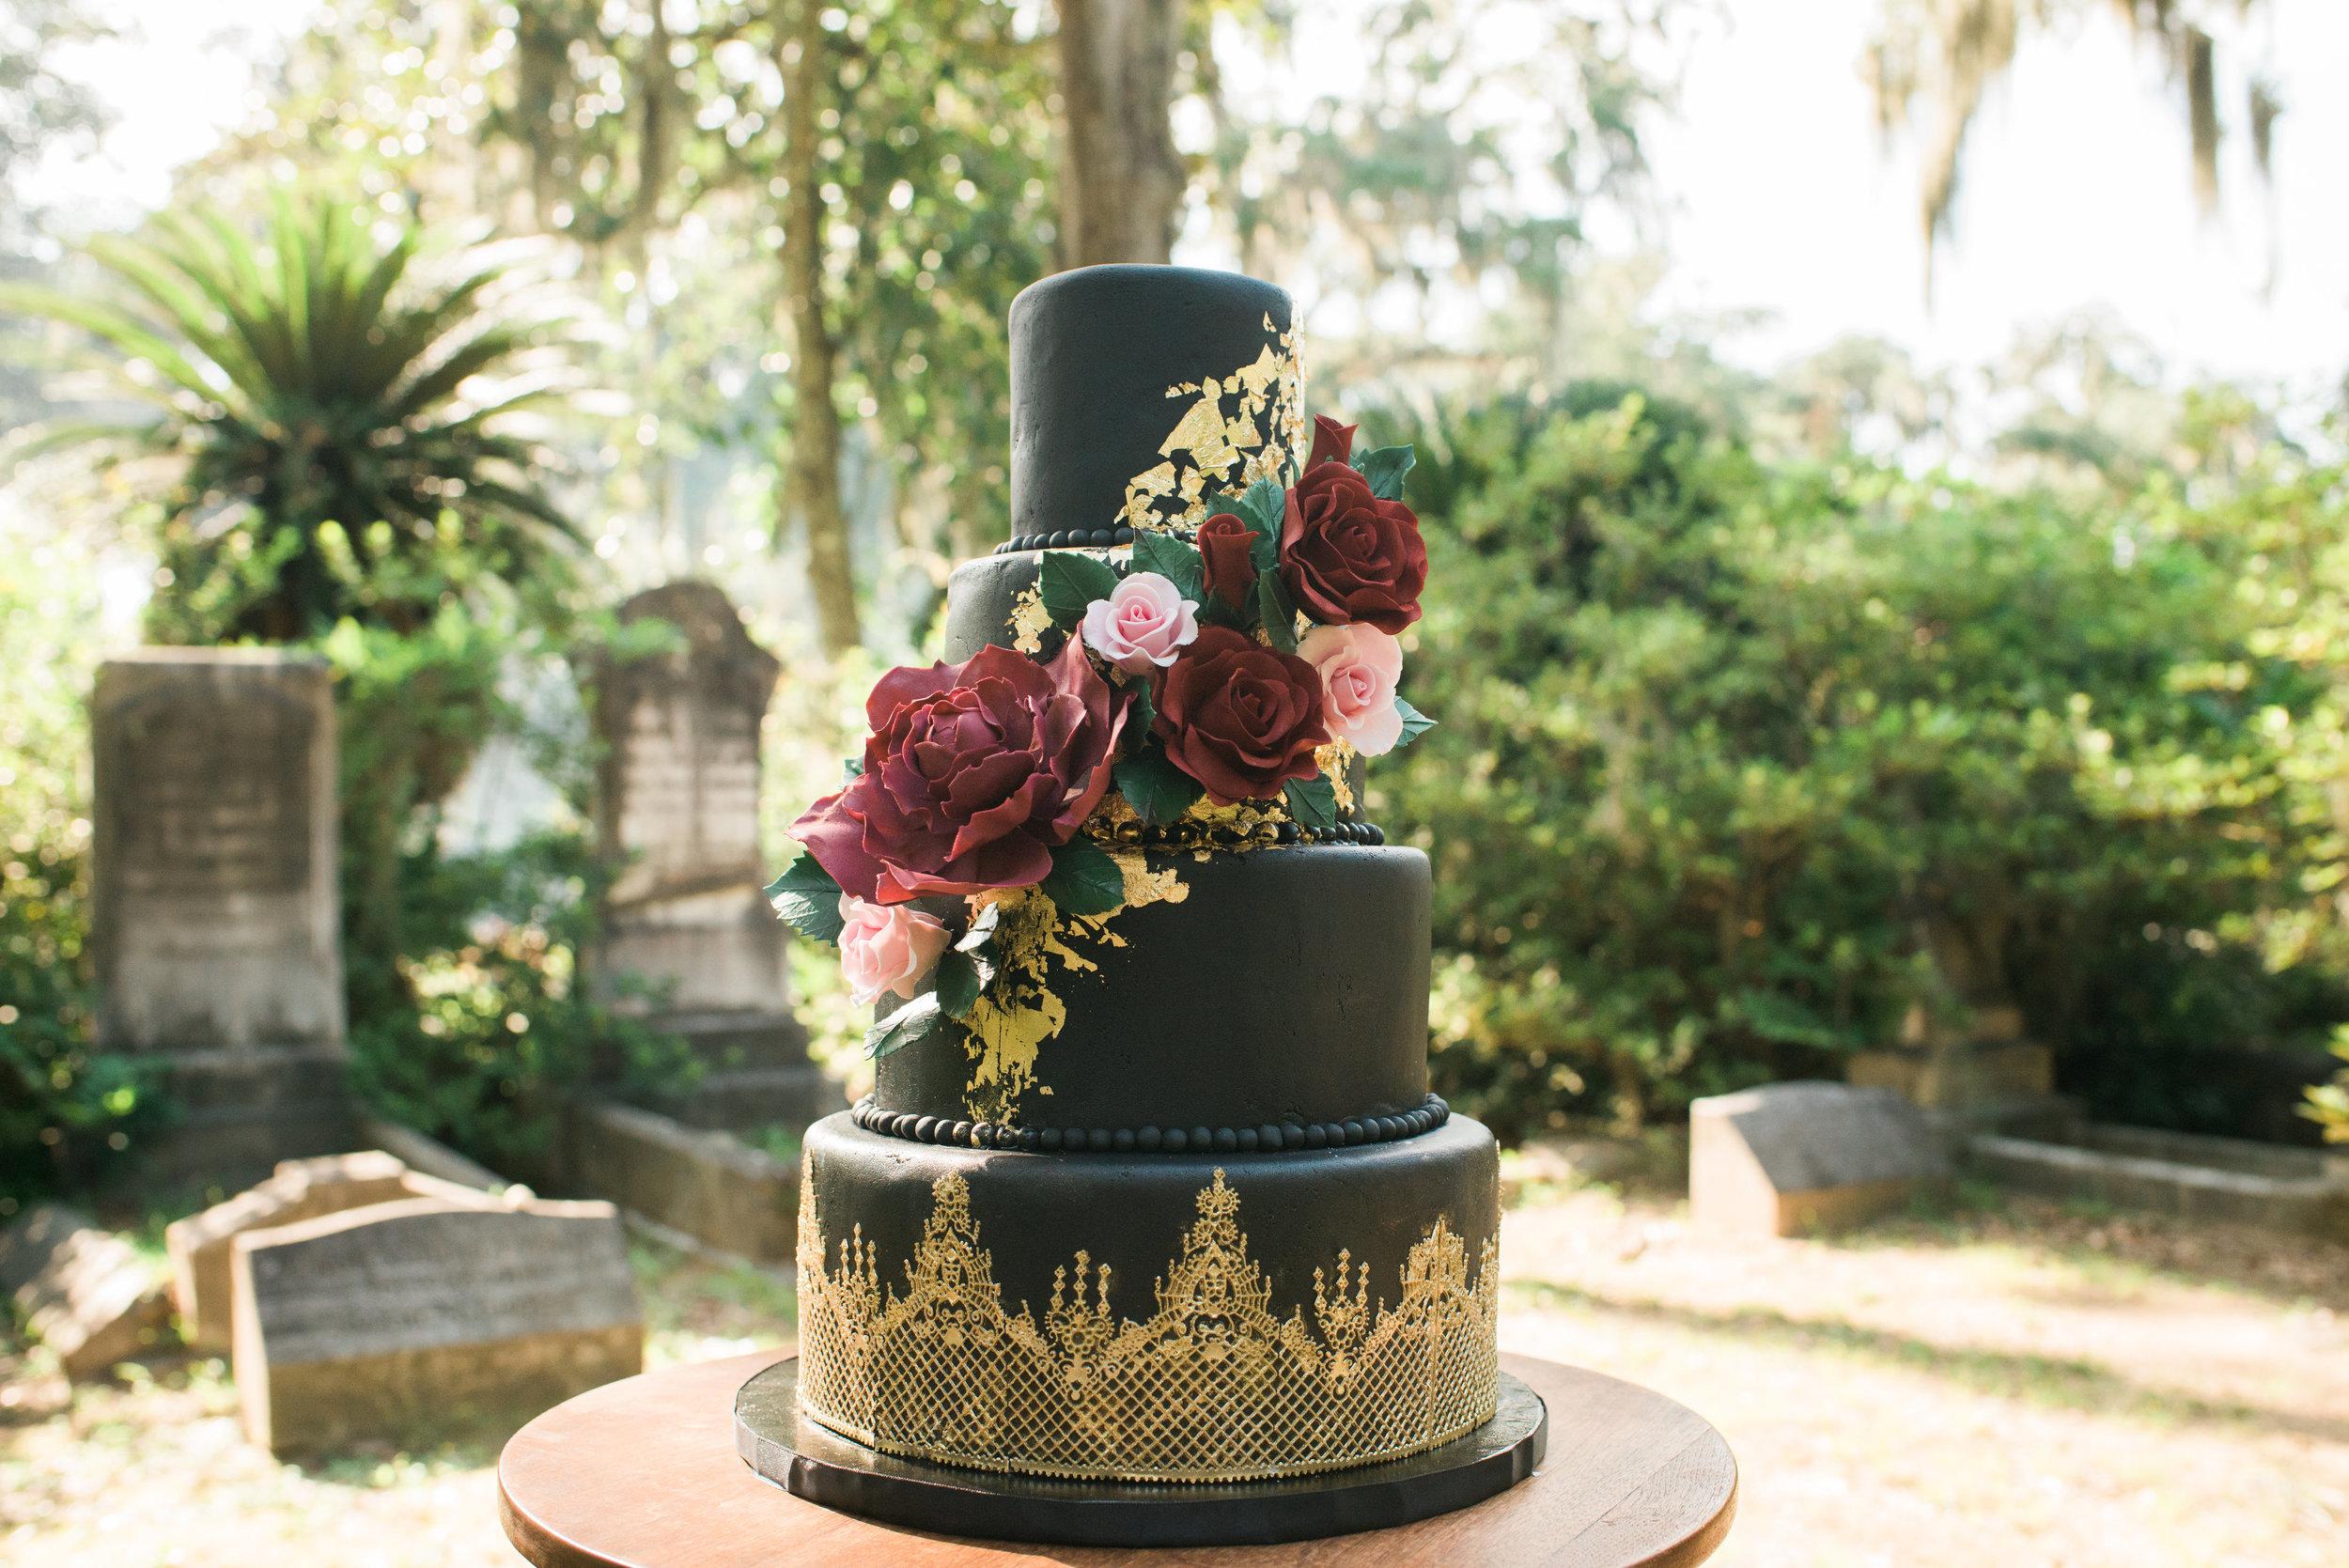 callie-beale-photography-Bonaventure-cemetery-michelle-royal-makeup-cemetery-wedding-ivory-and-beau-wedding-planning-anna-campbell-harper-savannah-bridal-boutique-savannah-wedding-dresses-savannah-weddings-17.jpg